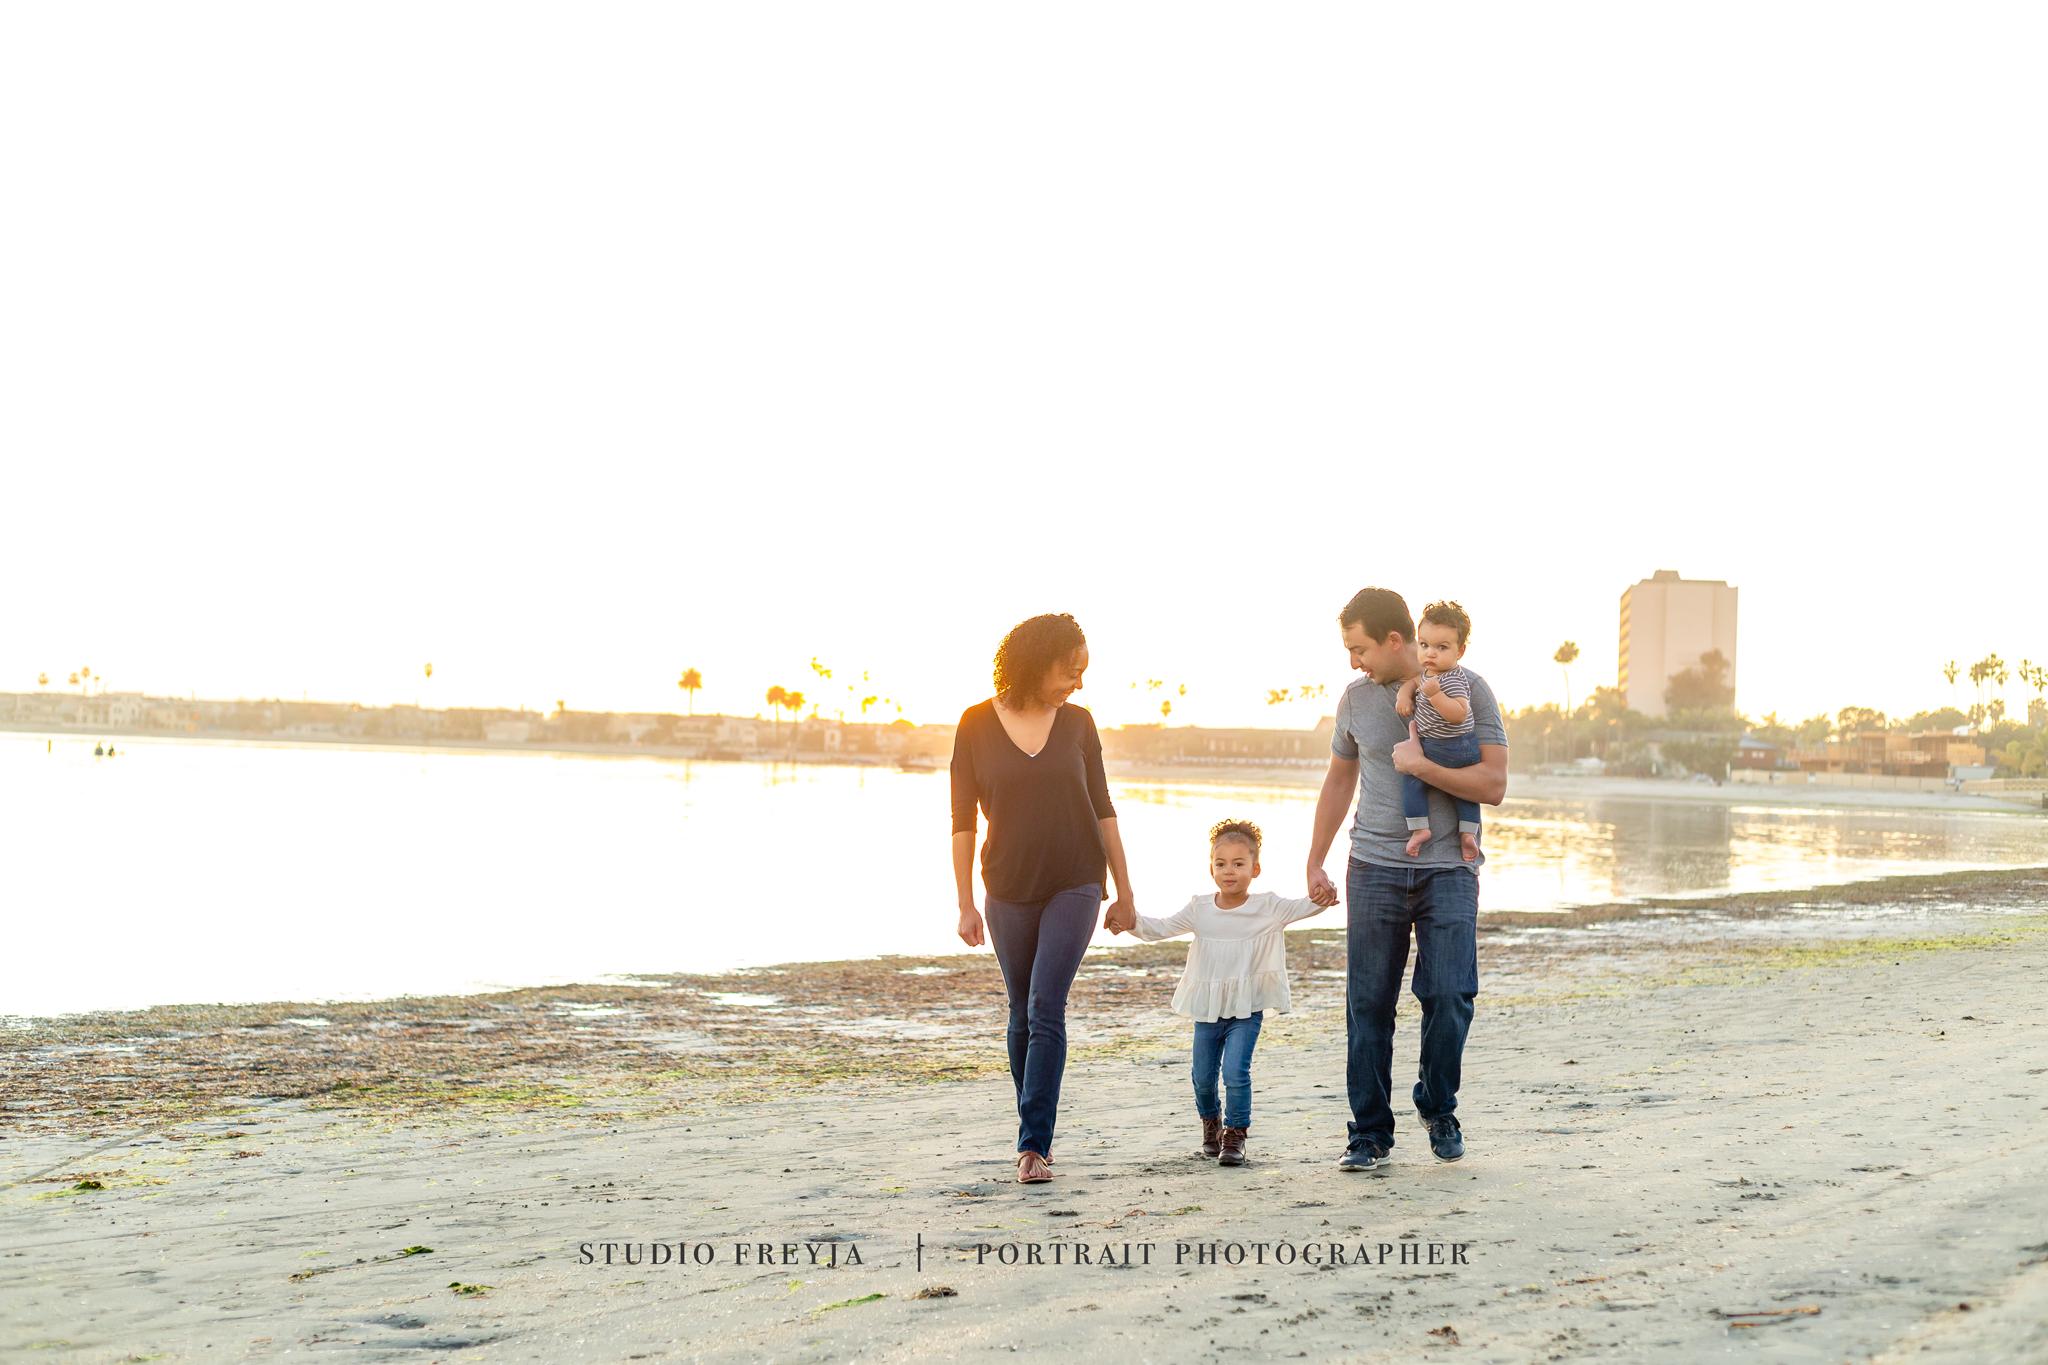 Kenan-Beach-Family-Pictures-Copyright-Studio-Freyja-(44-of-60).png